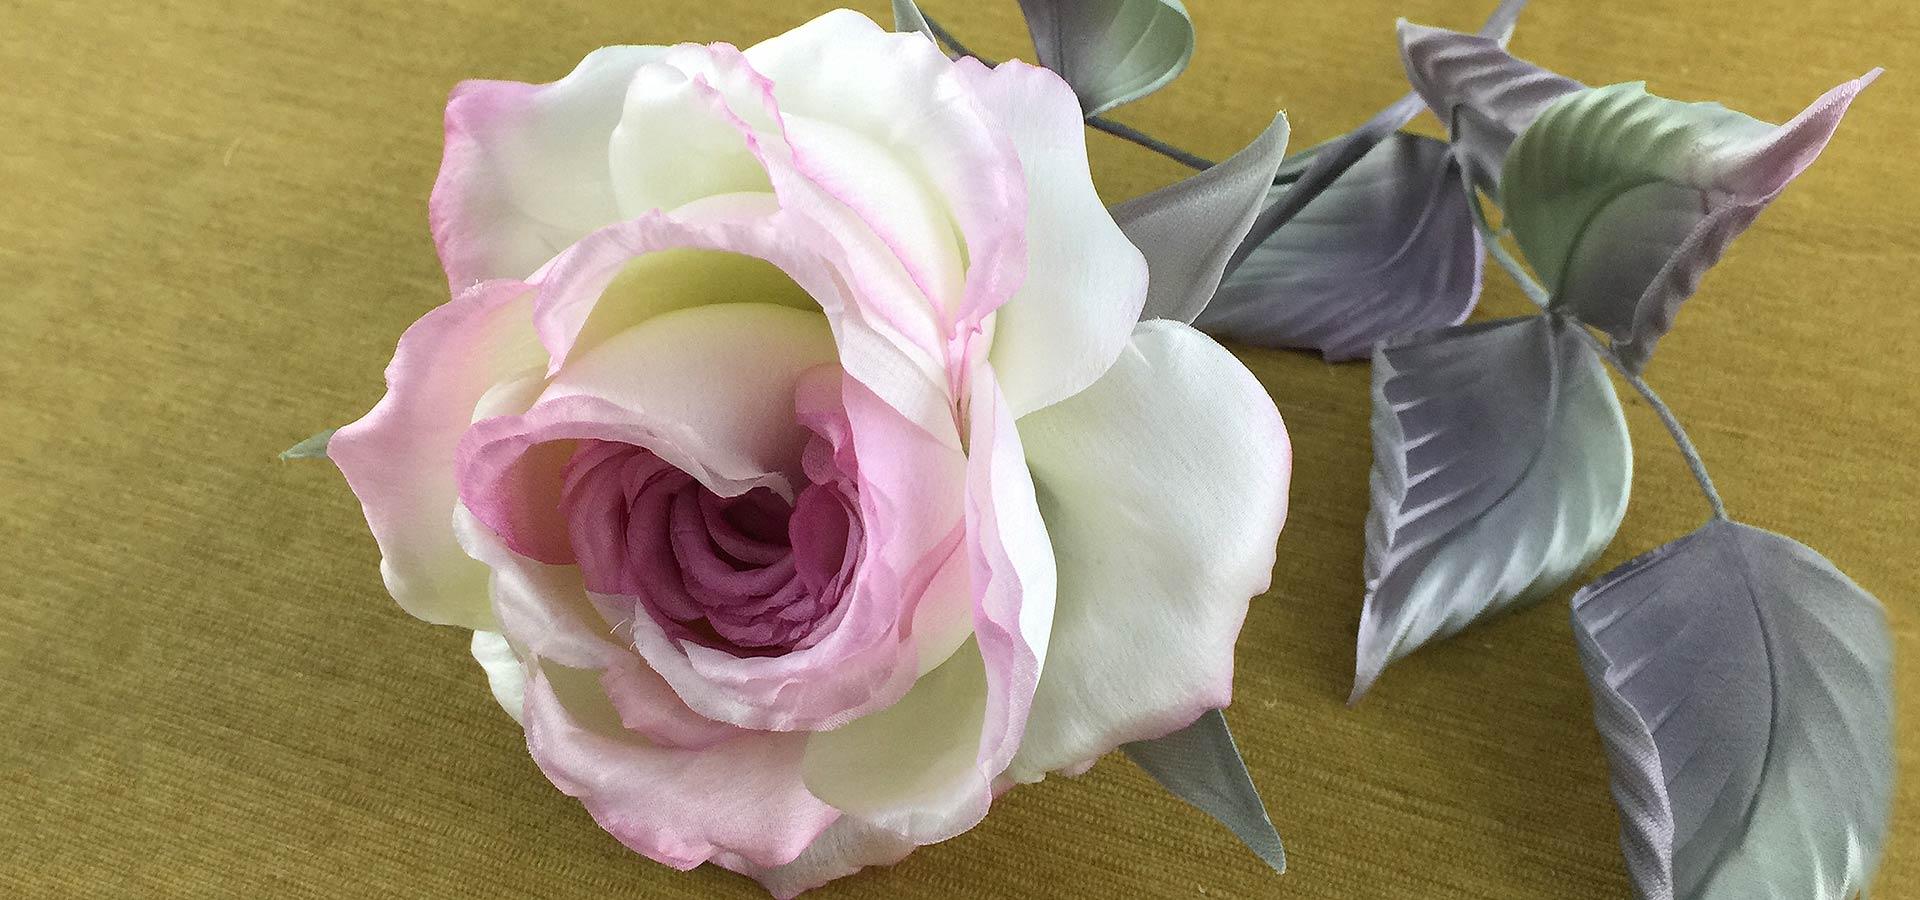 jp2-silk-rose-rozovaya